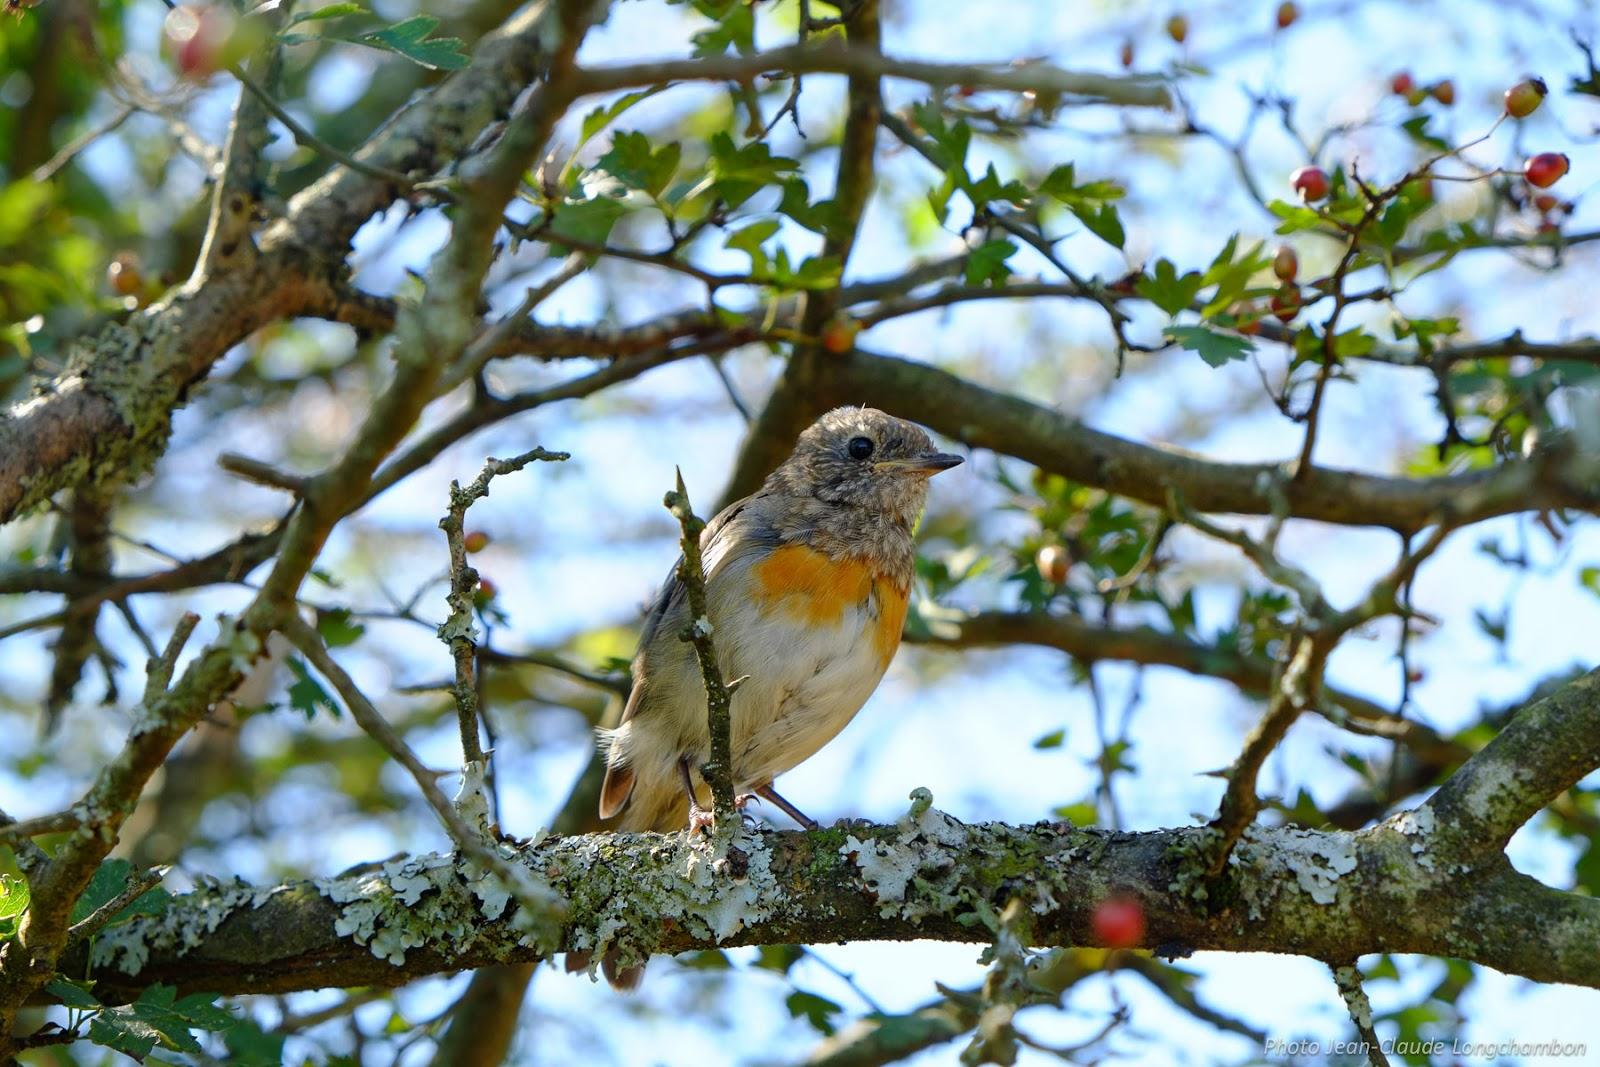 Impressions nature saint jean de luz col d 39 ibardin sare for Un petit oiseau